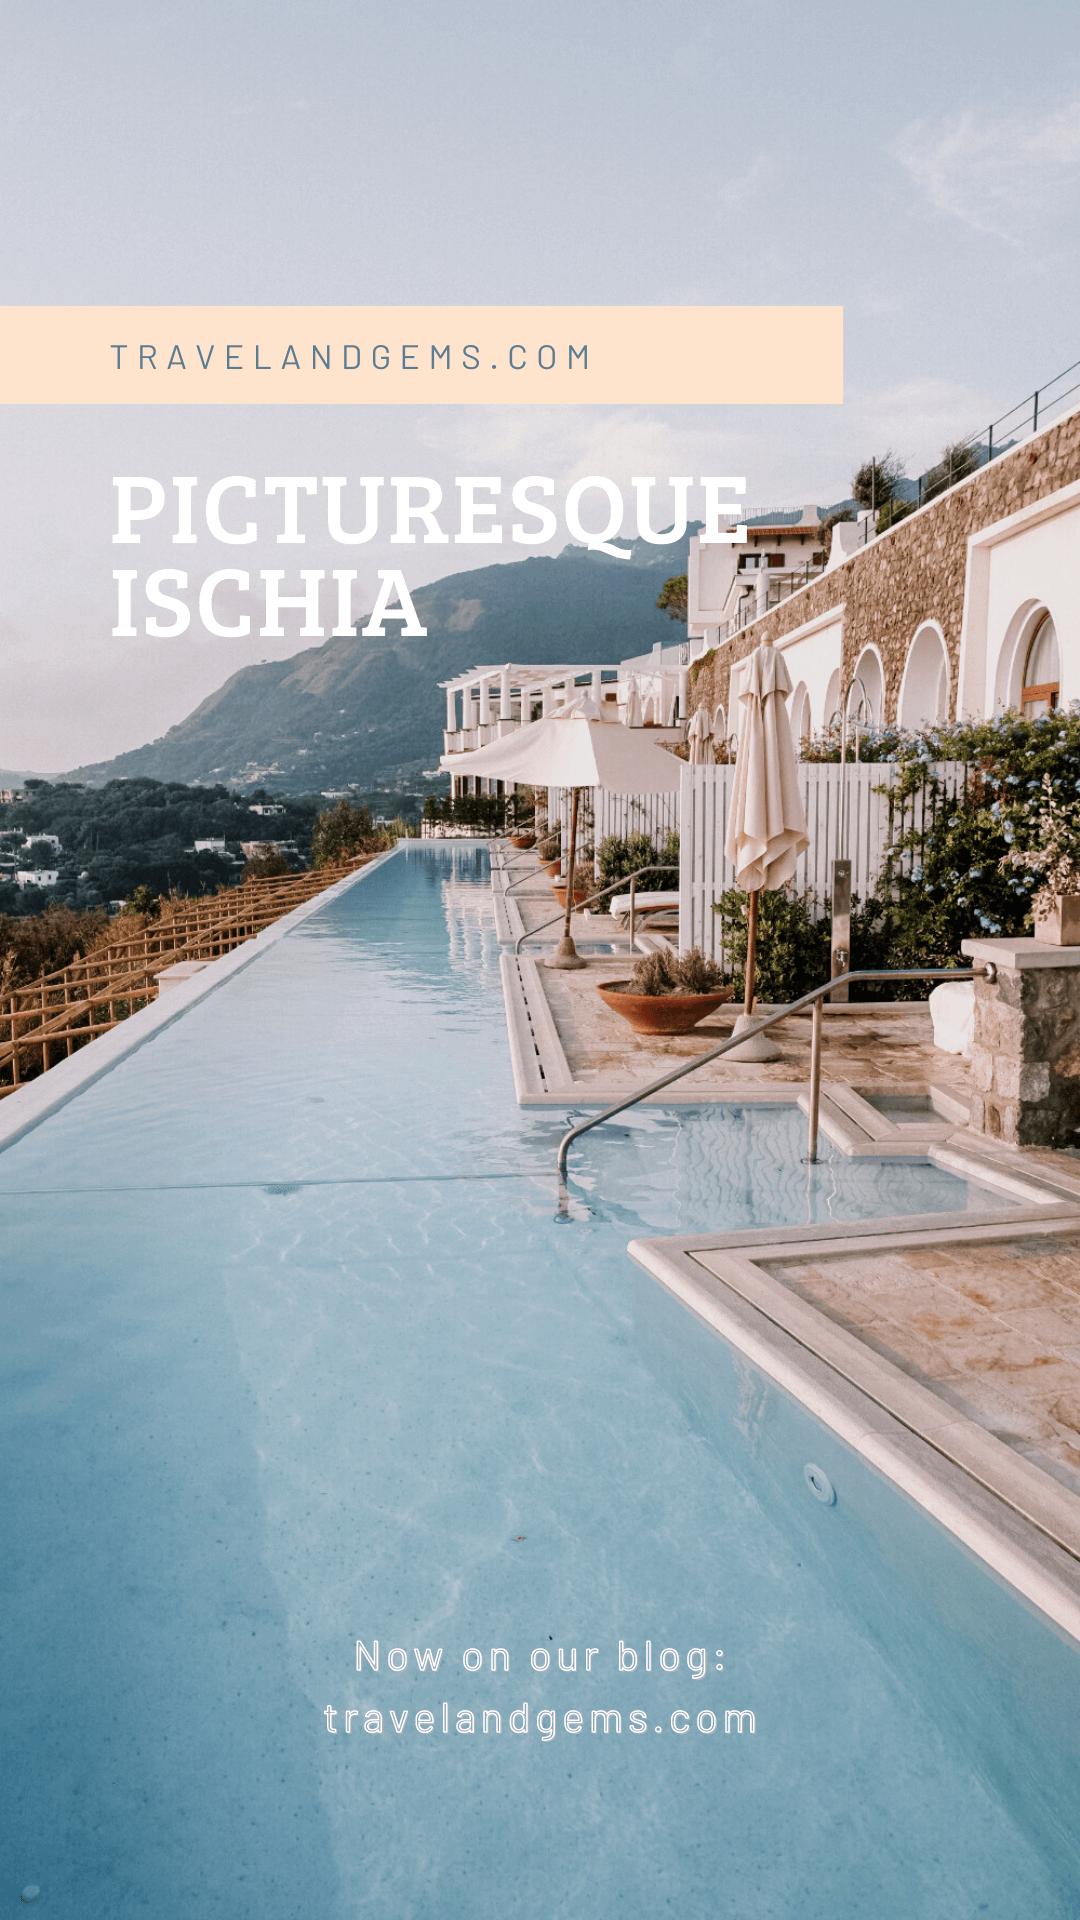 Ischia blog Travel and Gems